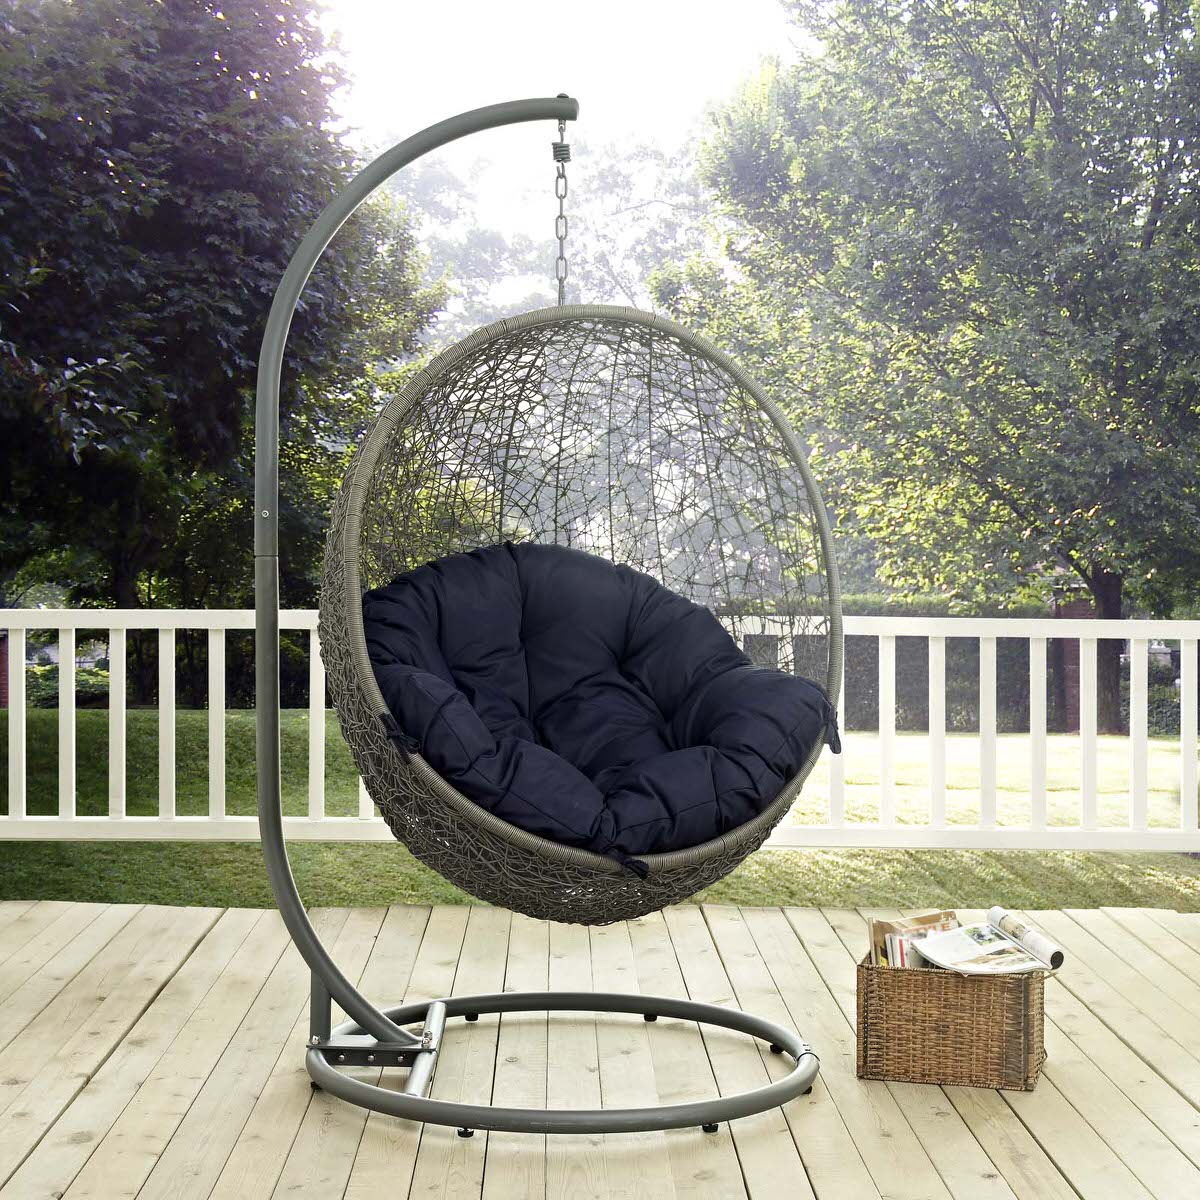 carregando est canopy a swing chair imagem steel person rocker porch patio adjustable with s itm outdoor